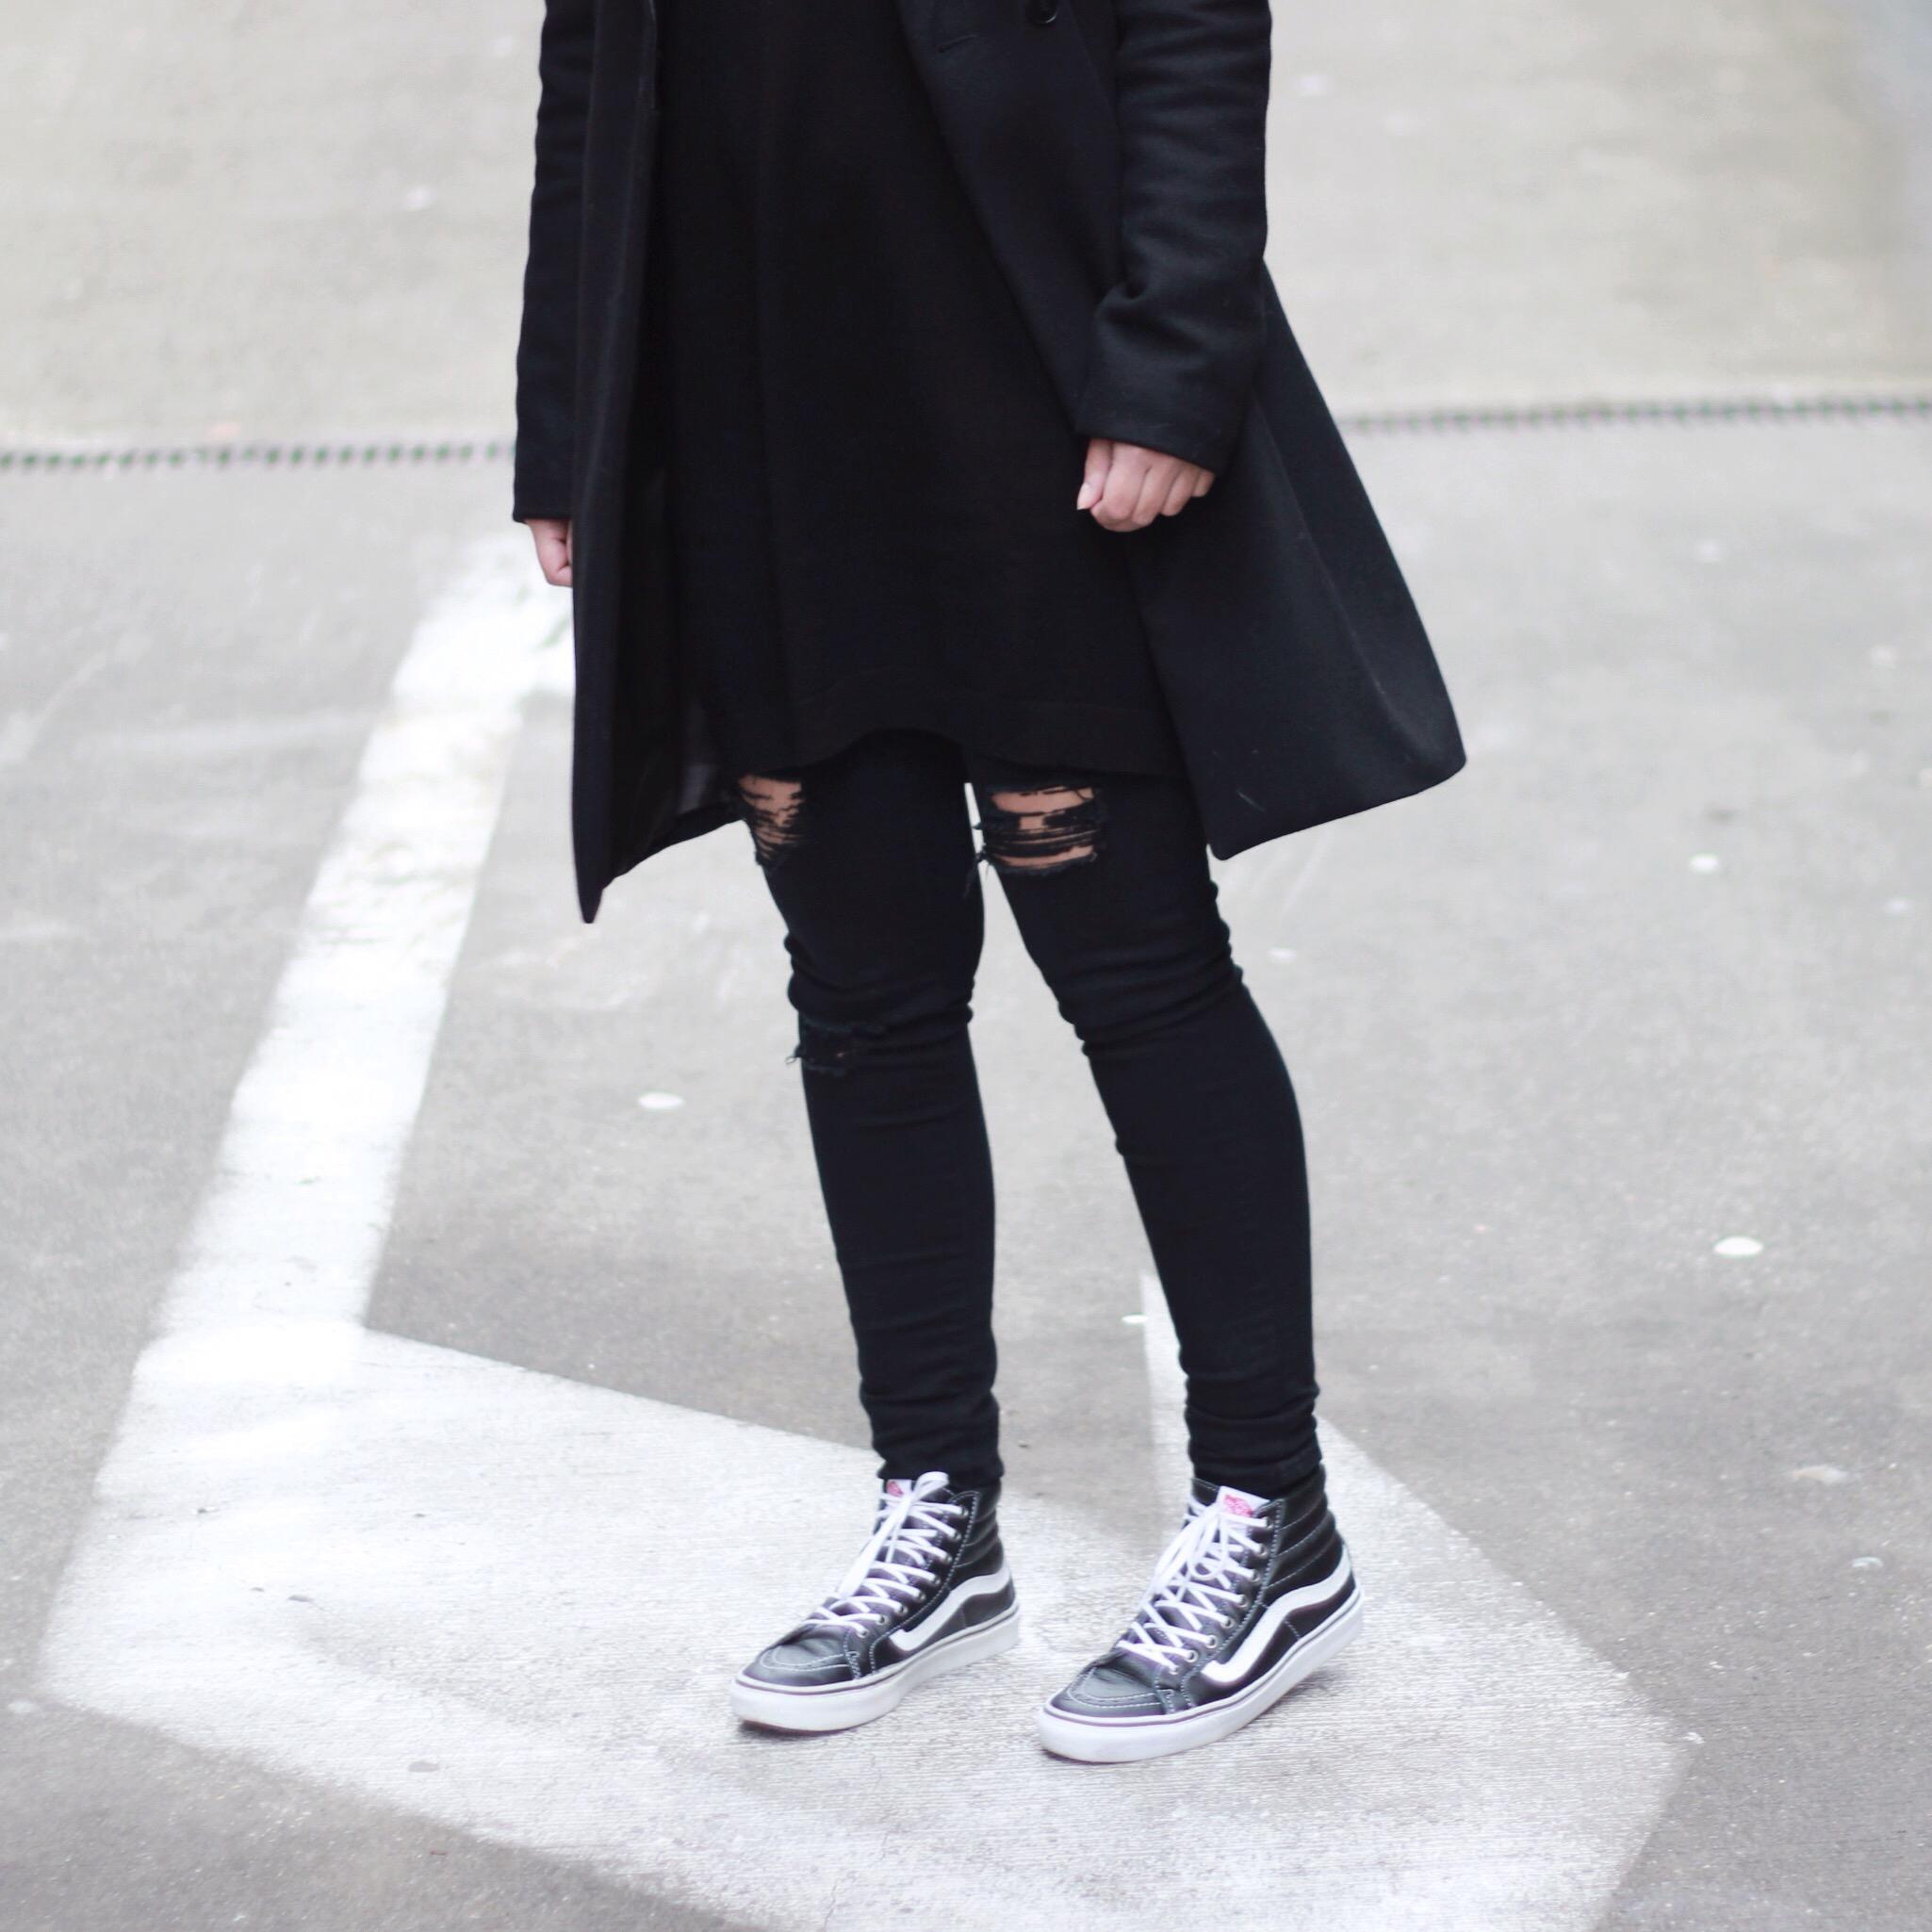 Vans Sk8 Hi Black Outfit